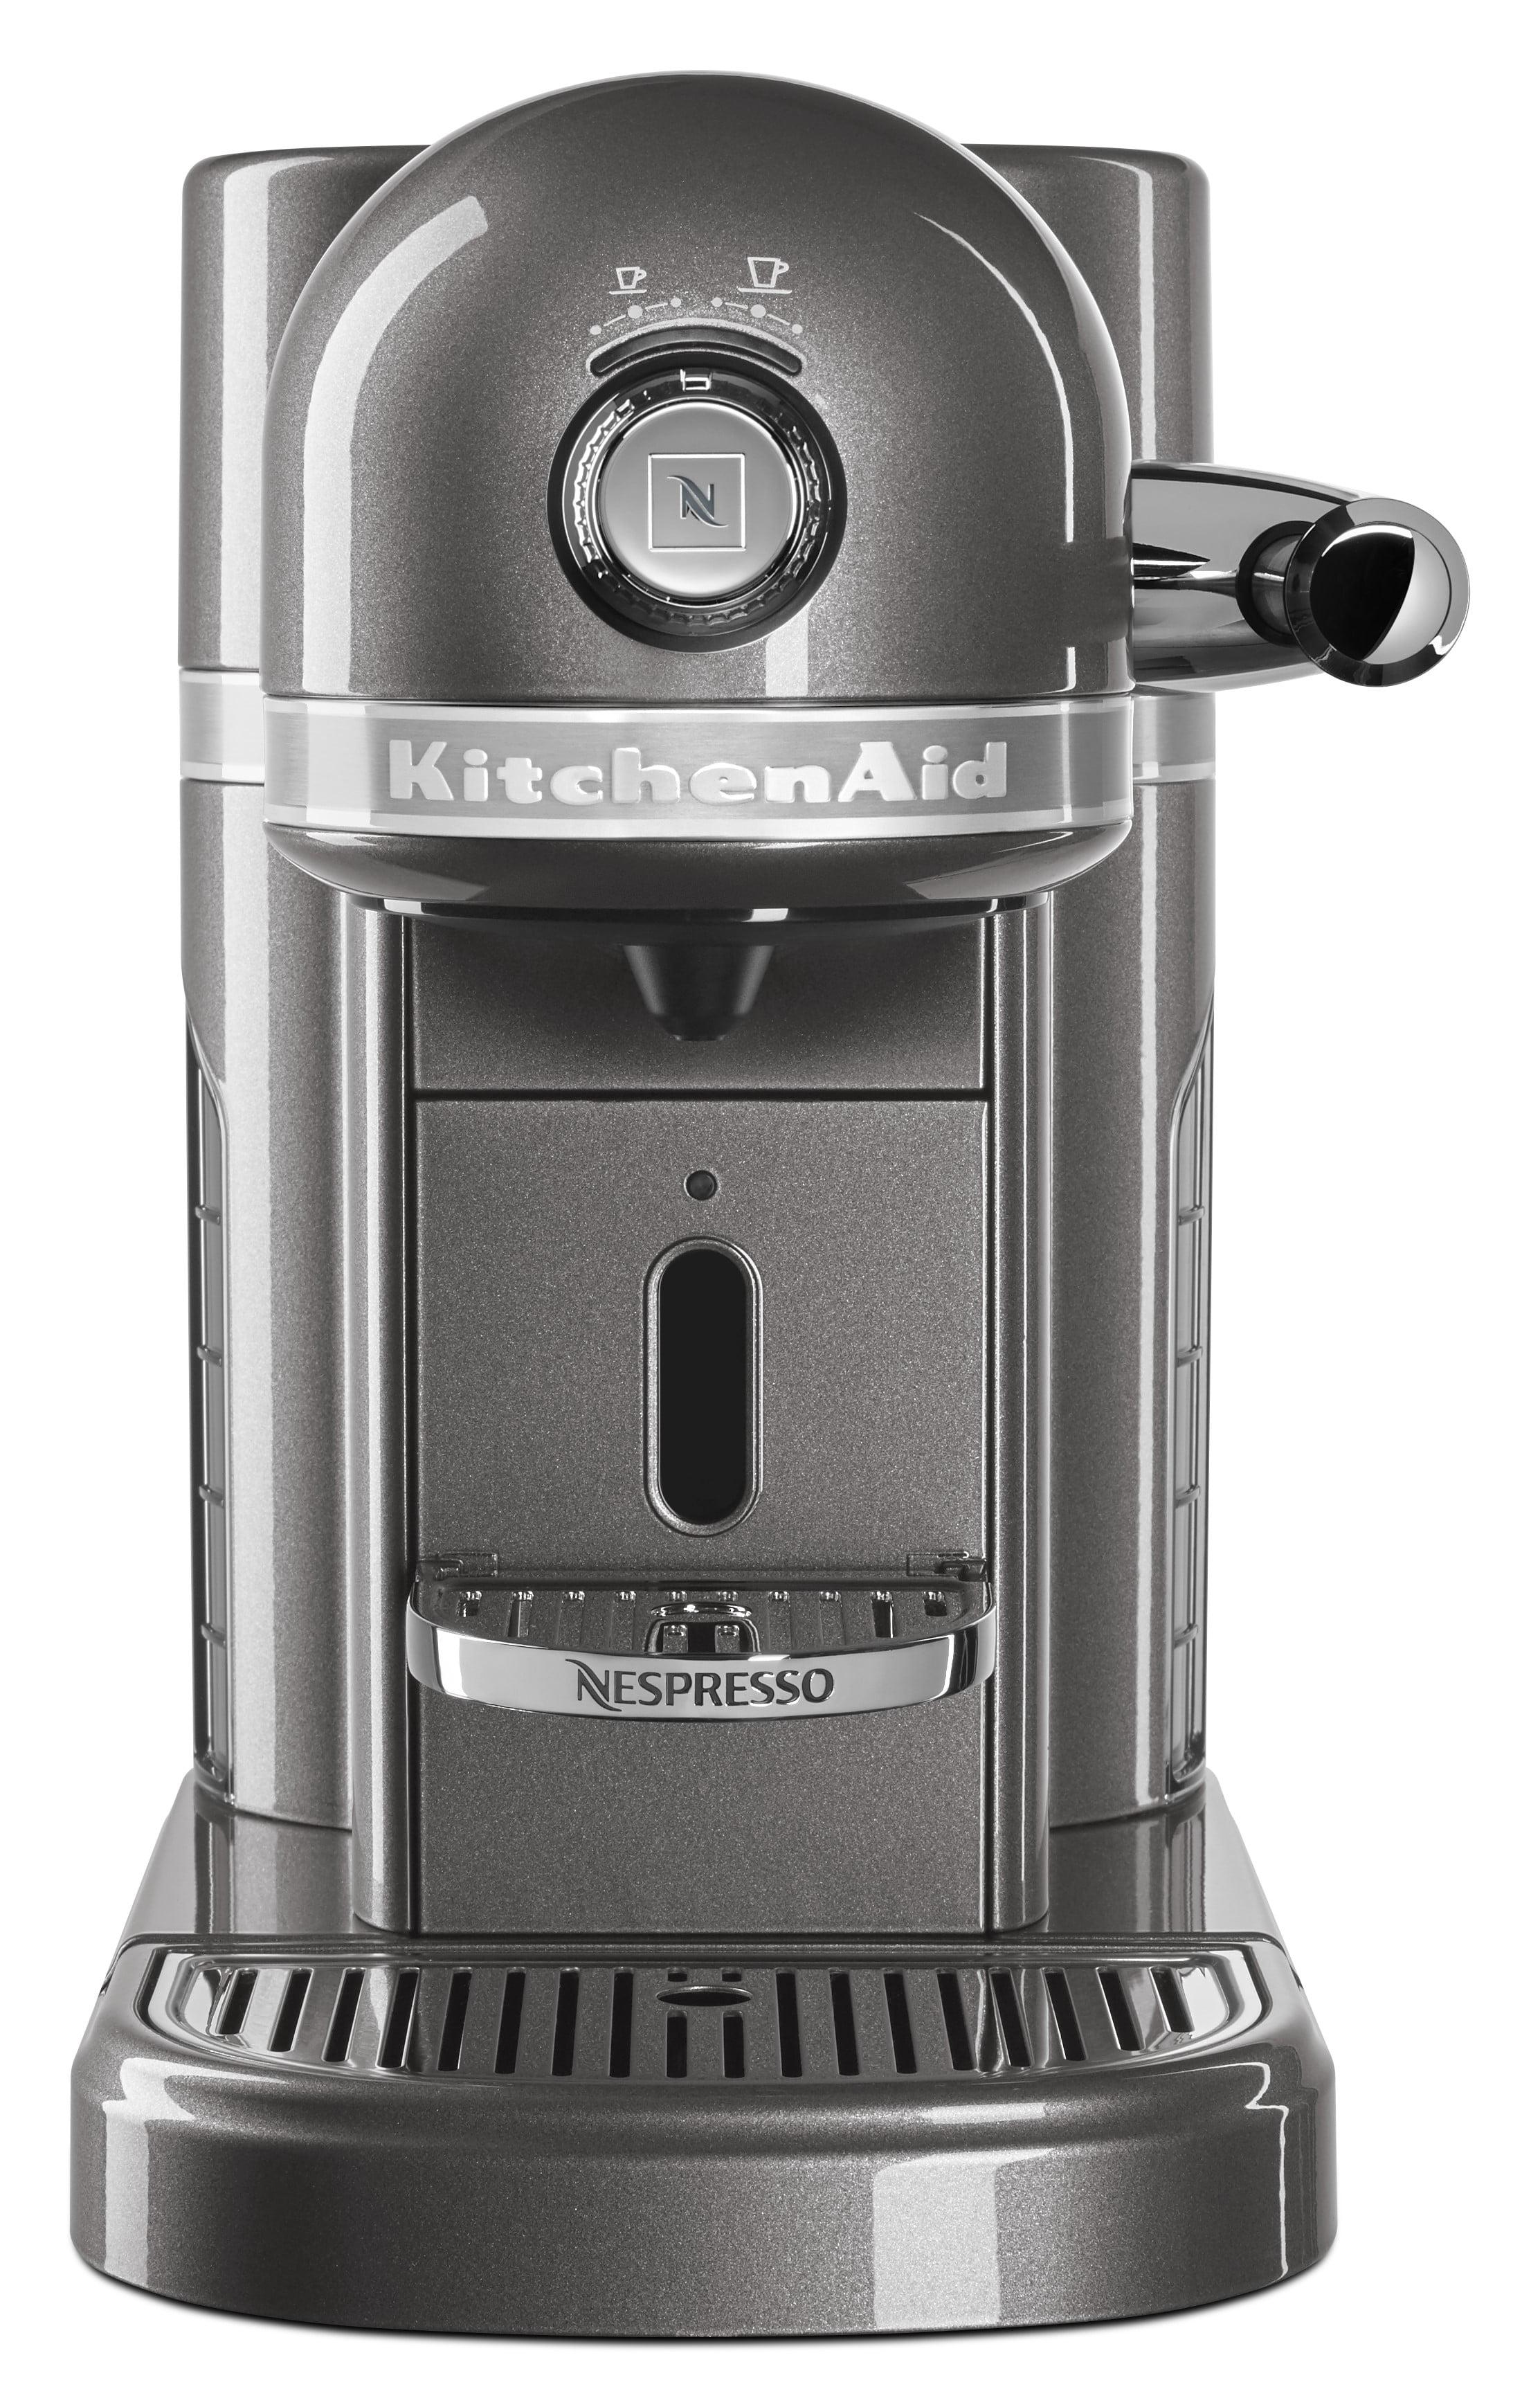 f95c2f486101 Nespresso Espresso Maker by KitchenAid with Milk Frother (KES0504MS) -  Walmart.com